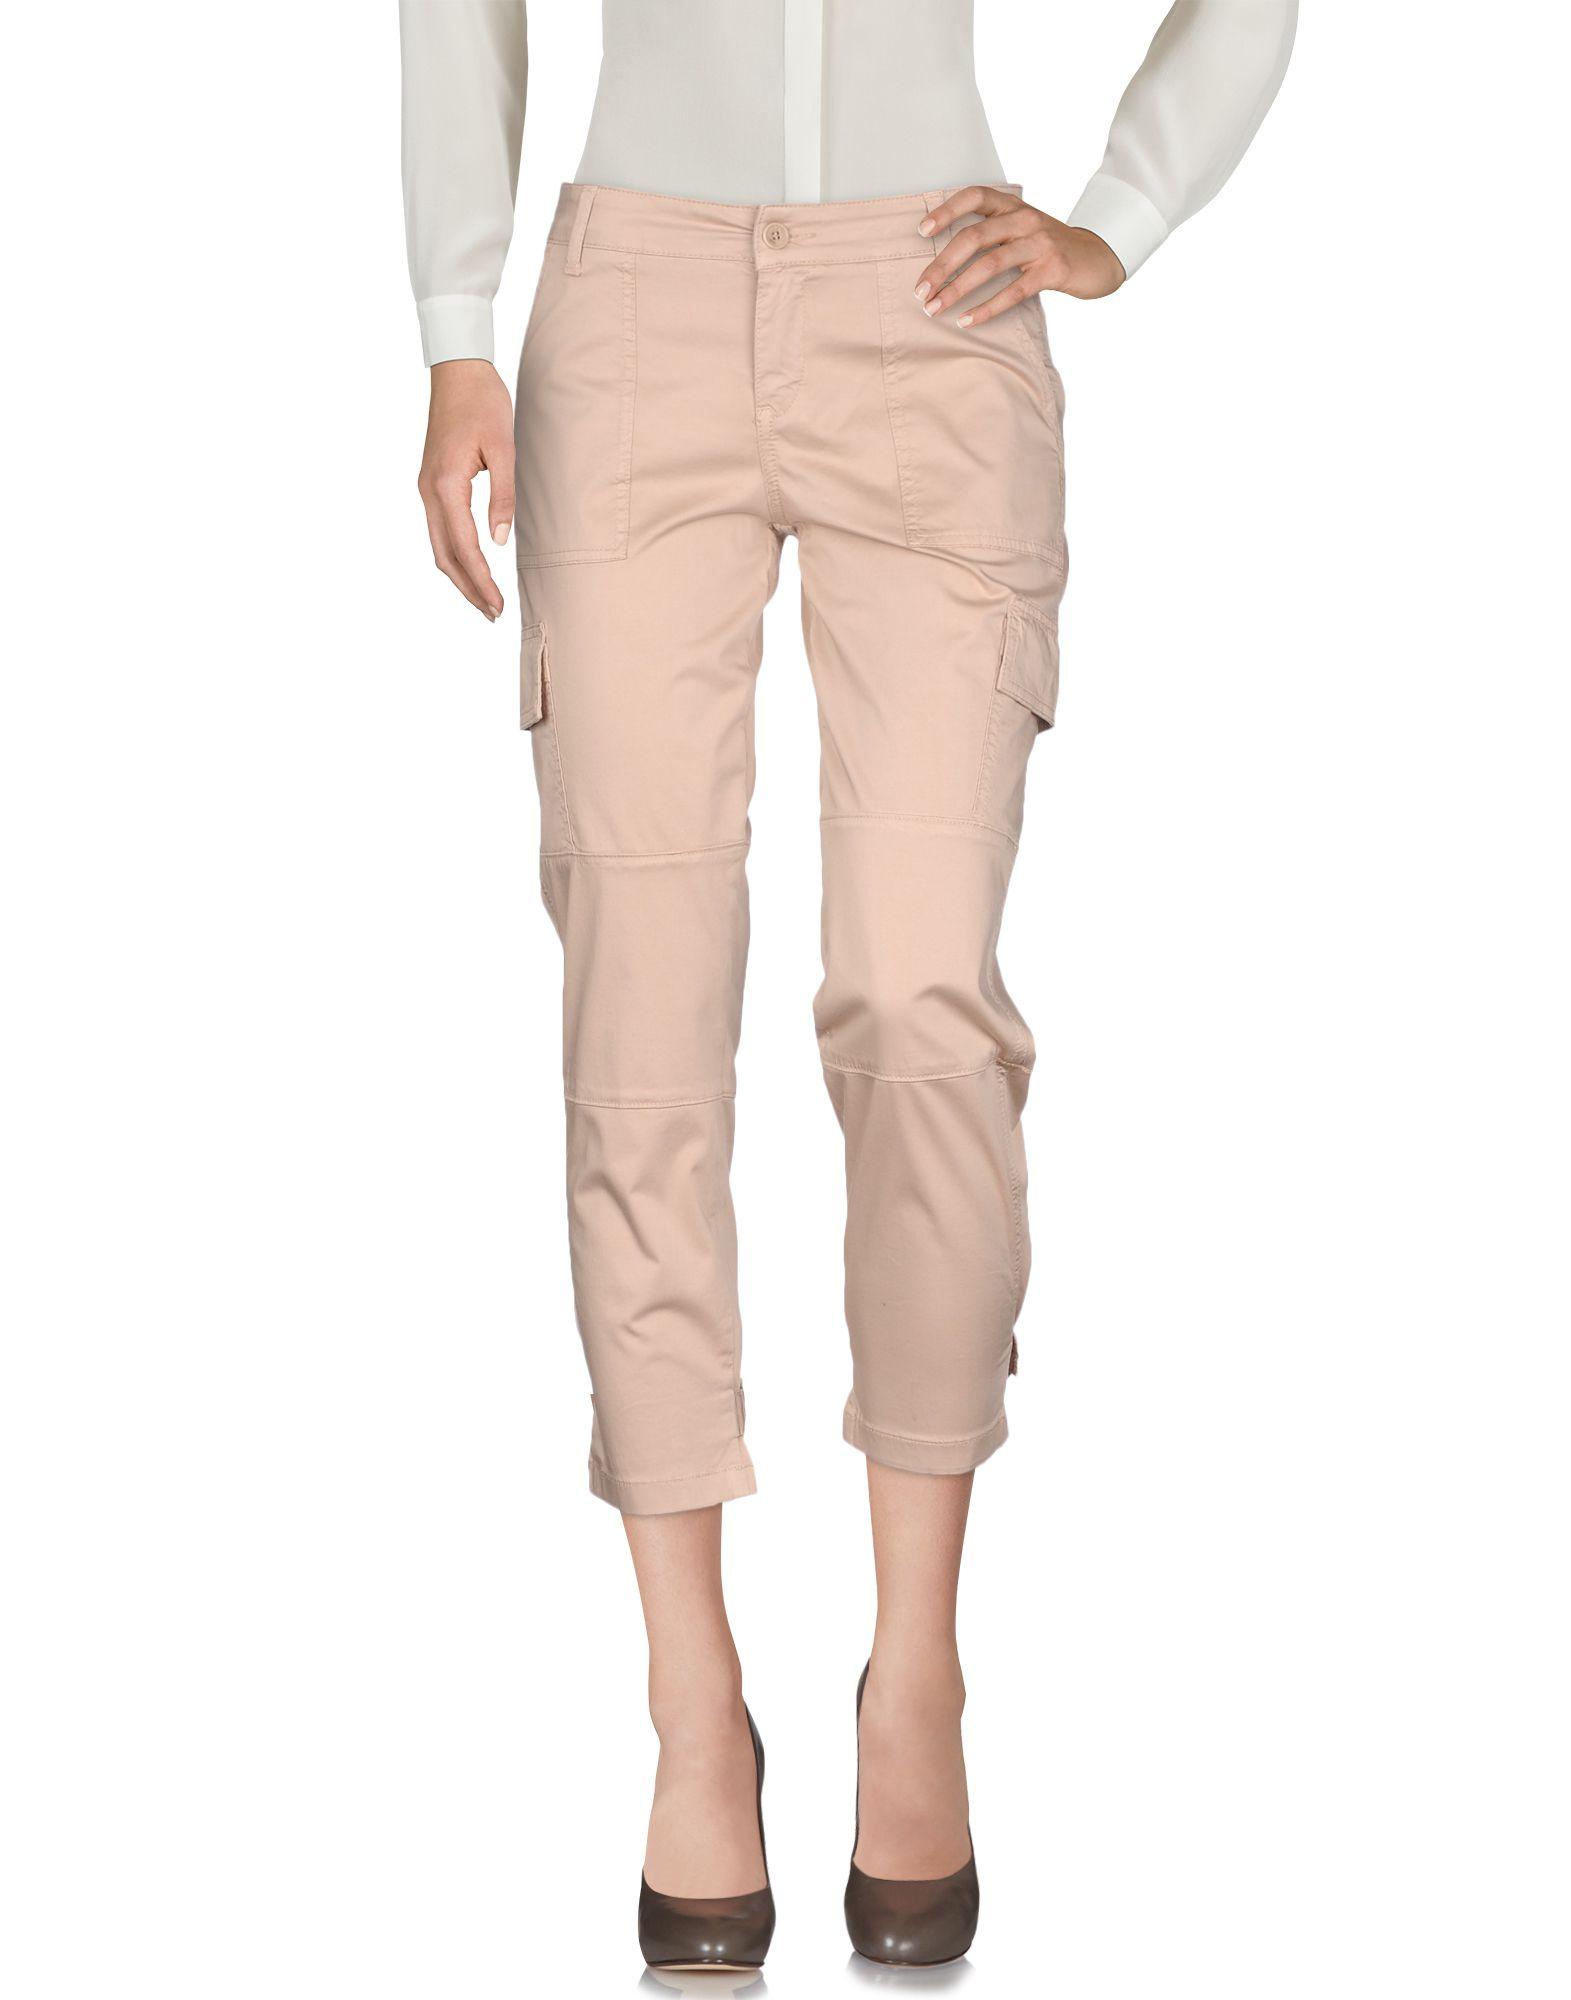 Pantalone Taperosso Taperosso Liu •Jo donna - 13178361OT  Beliebt